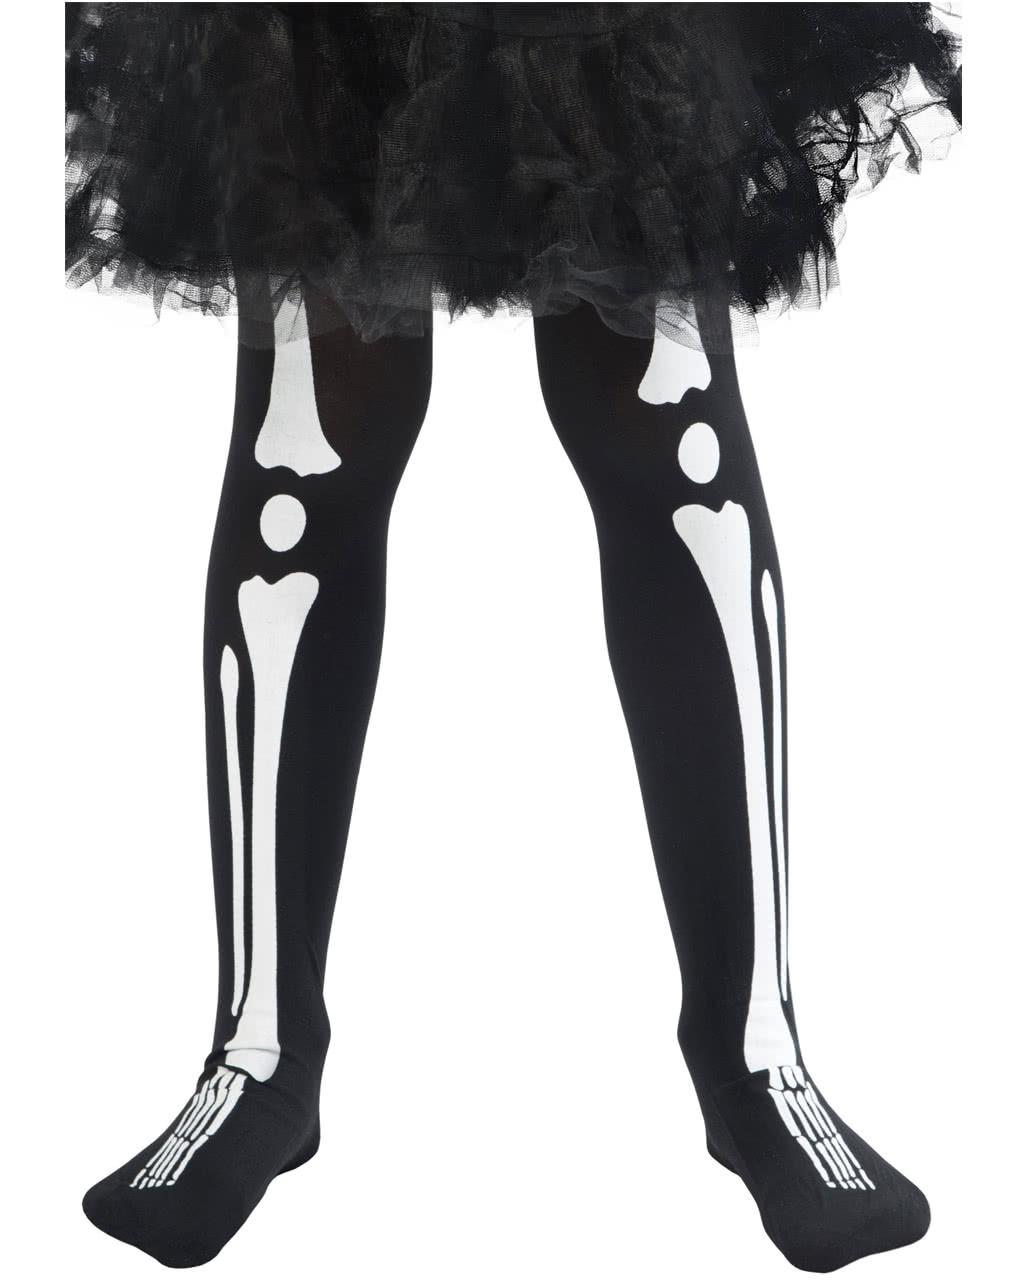 4a4f2864434 Skeleton children s tights